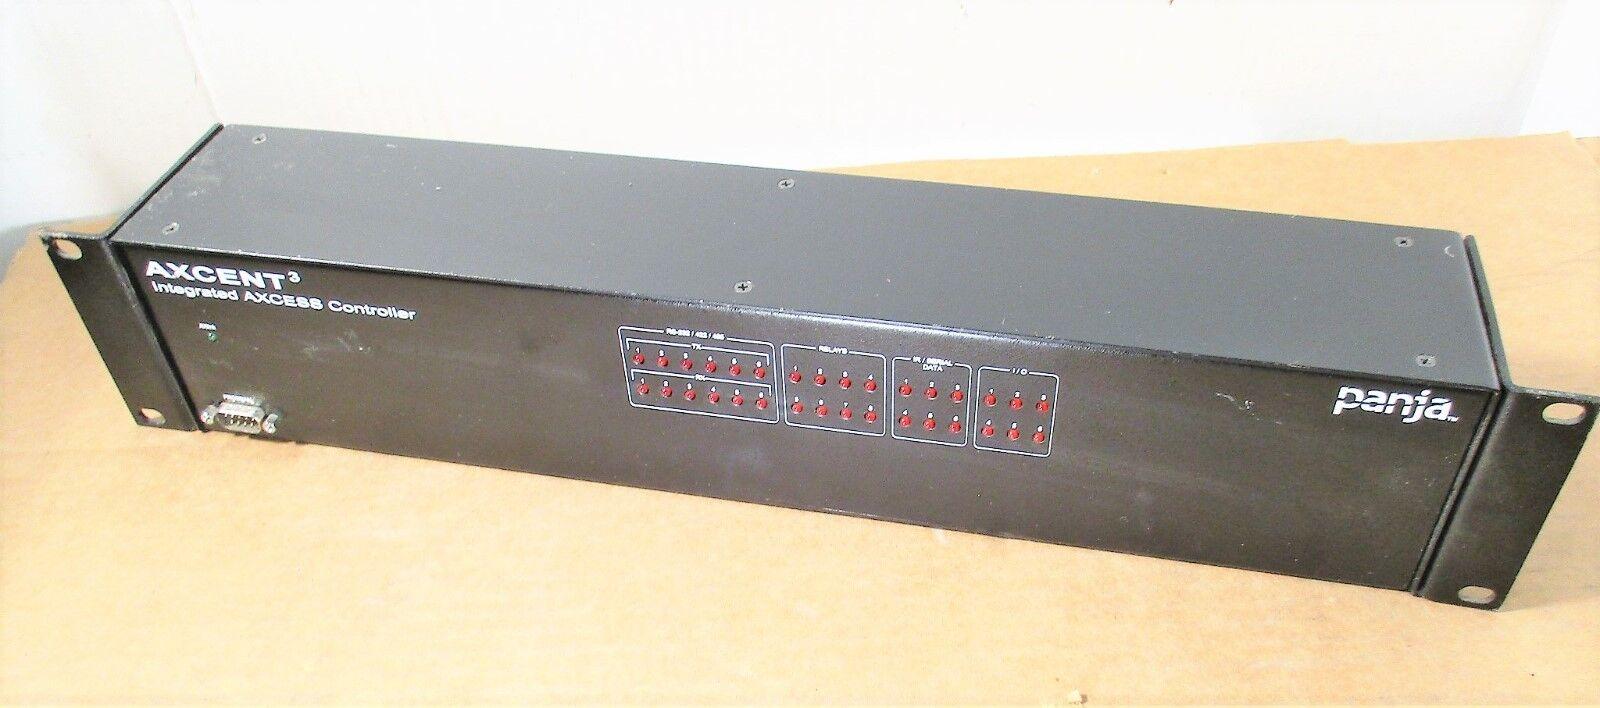 Panja Axcent 3 Integrated Axcess Controller